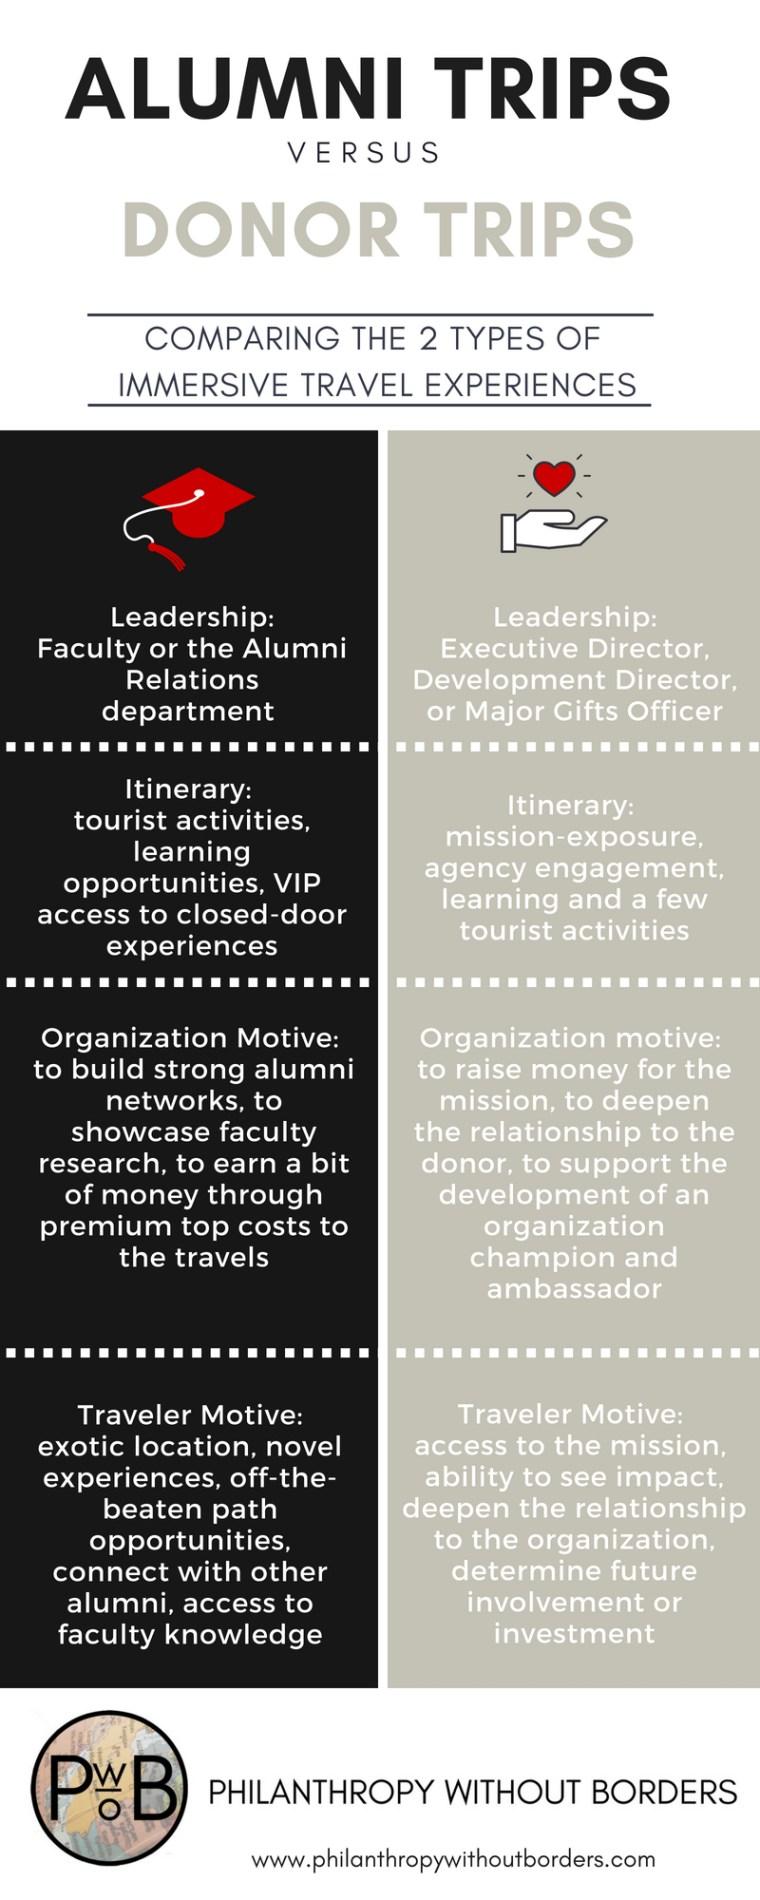 Alumni Trips